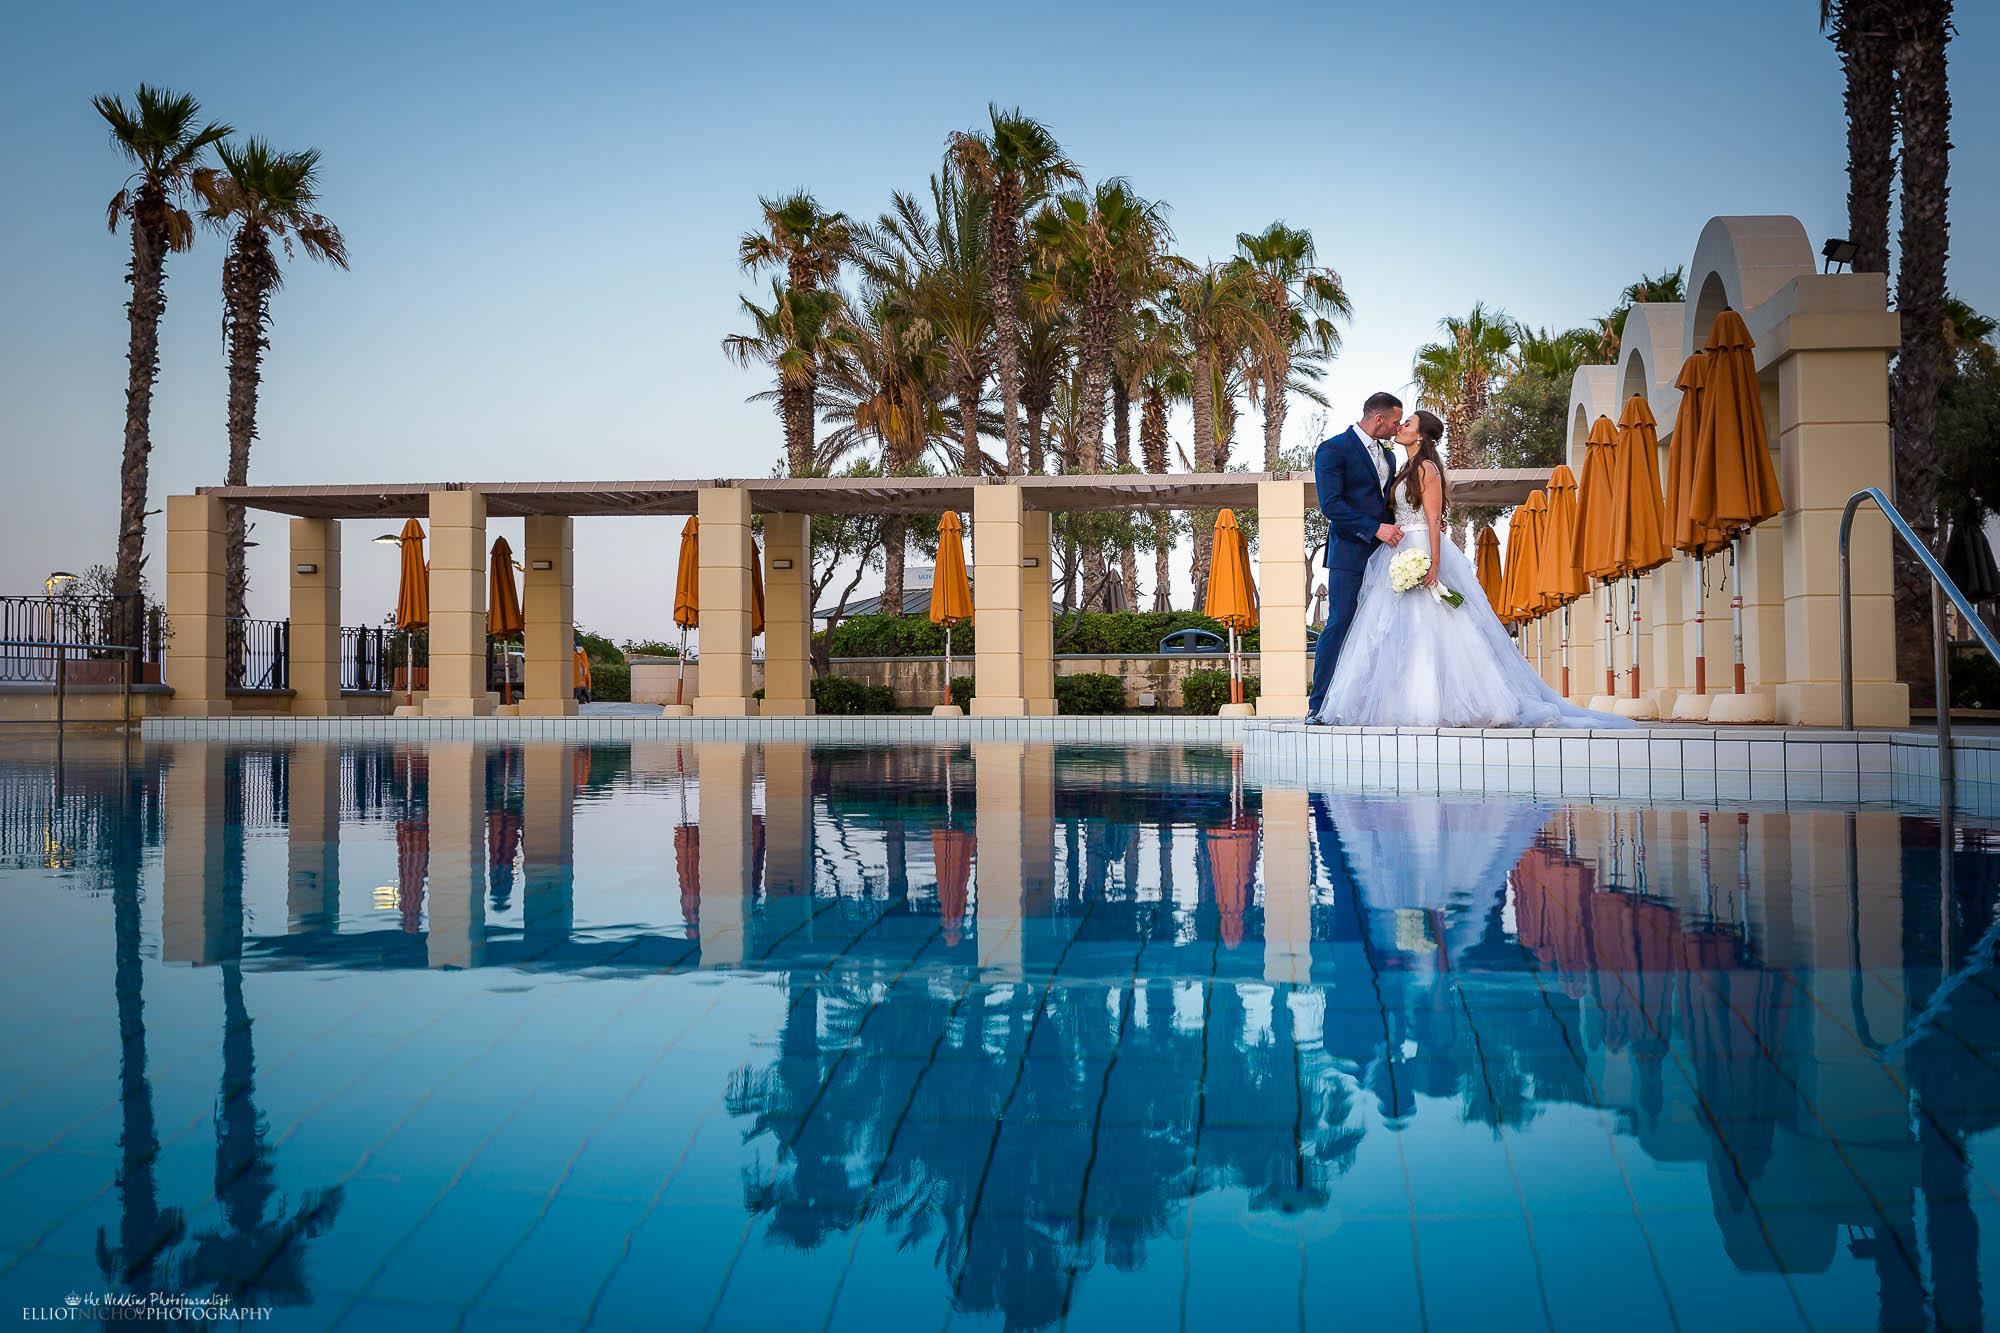 Destination newlyweds kissing by their wedding venue swimming pool.